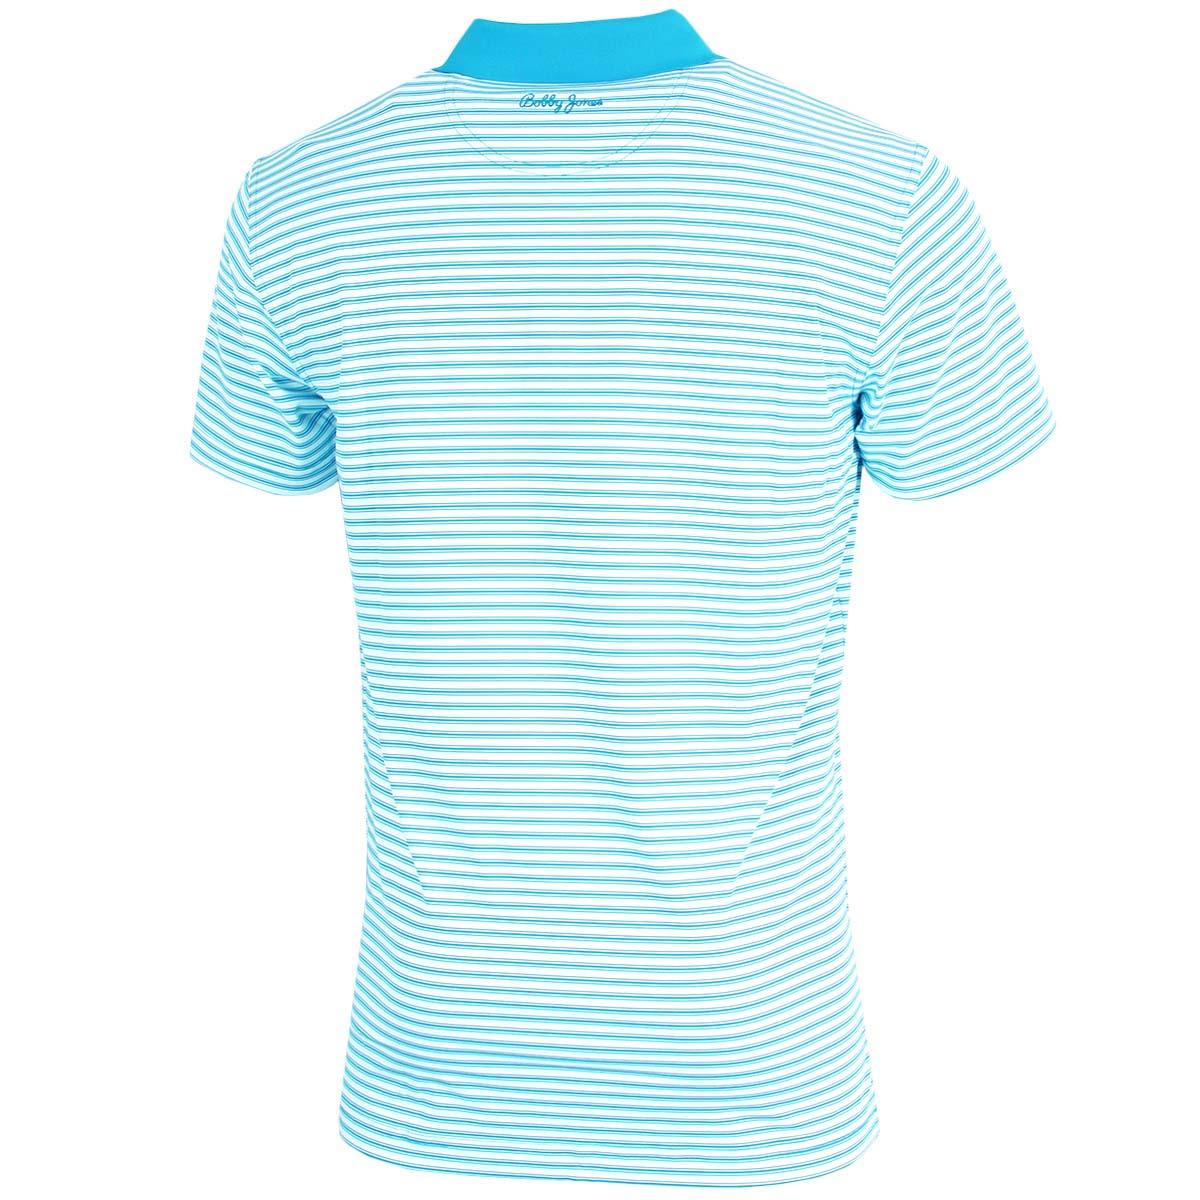 Bobby-Jones-Mens-XH20-Frame-Stripe-European-Fit-Golf-Polo-Shirt-72-OFF-RRP thumbnail 3